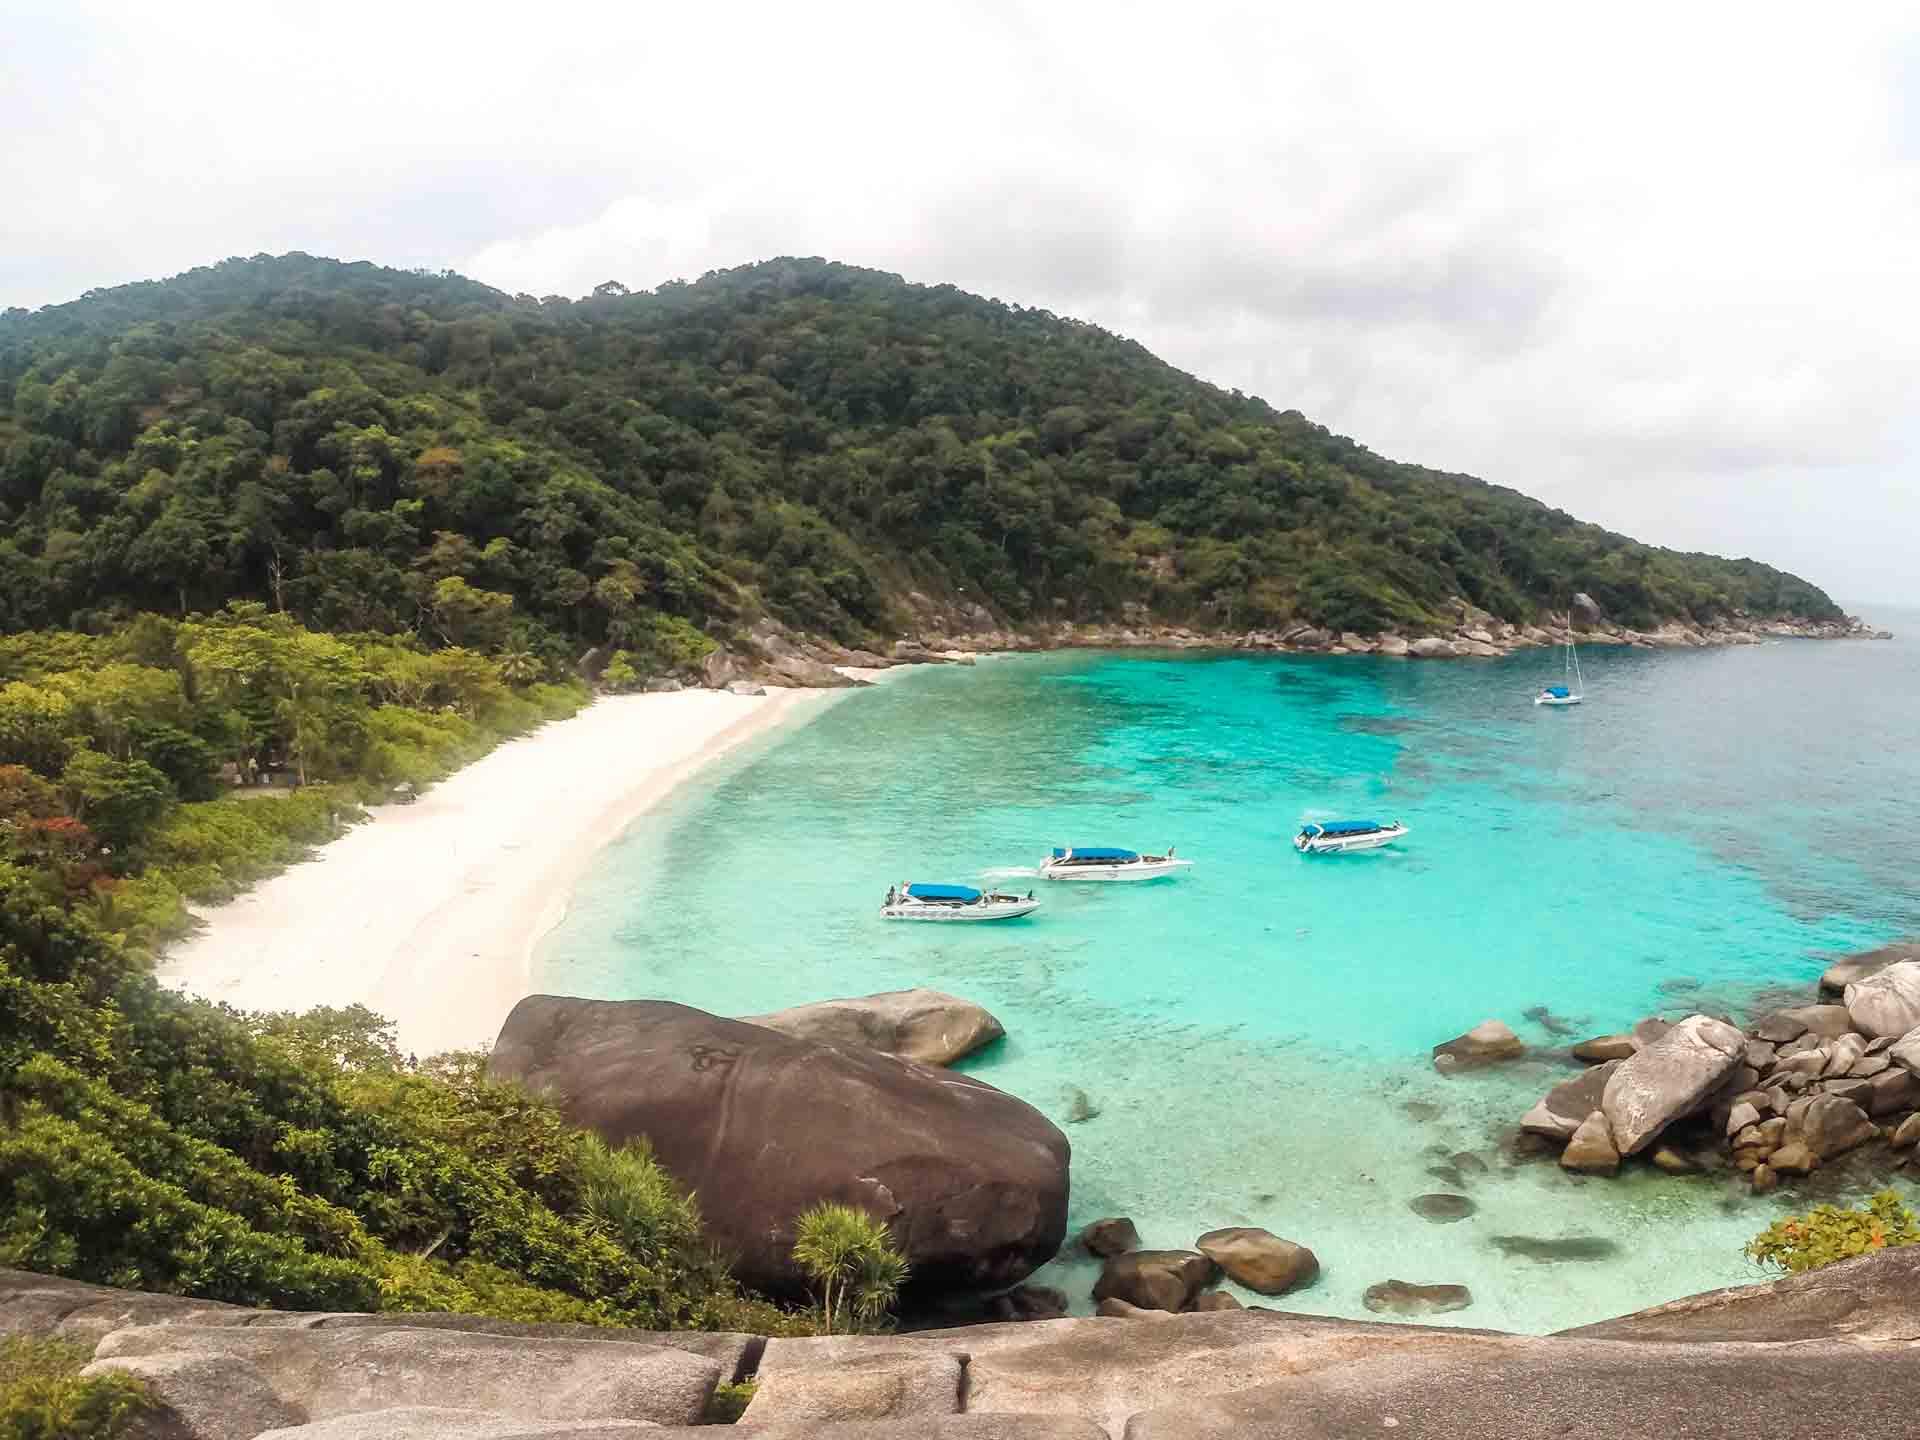 Thailand - Similan Islands